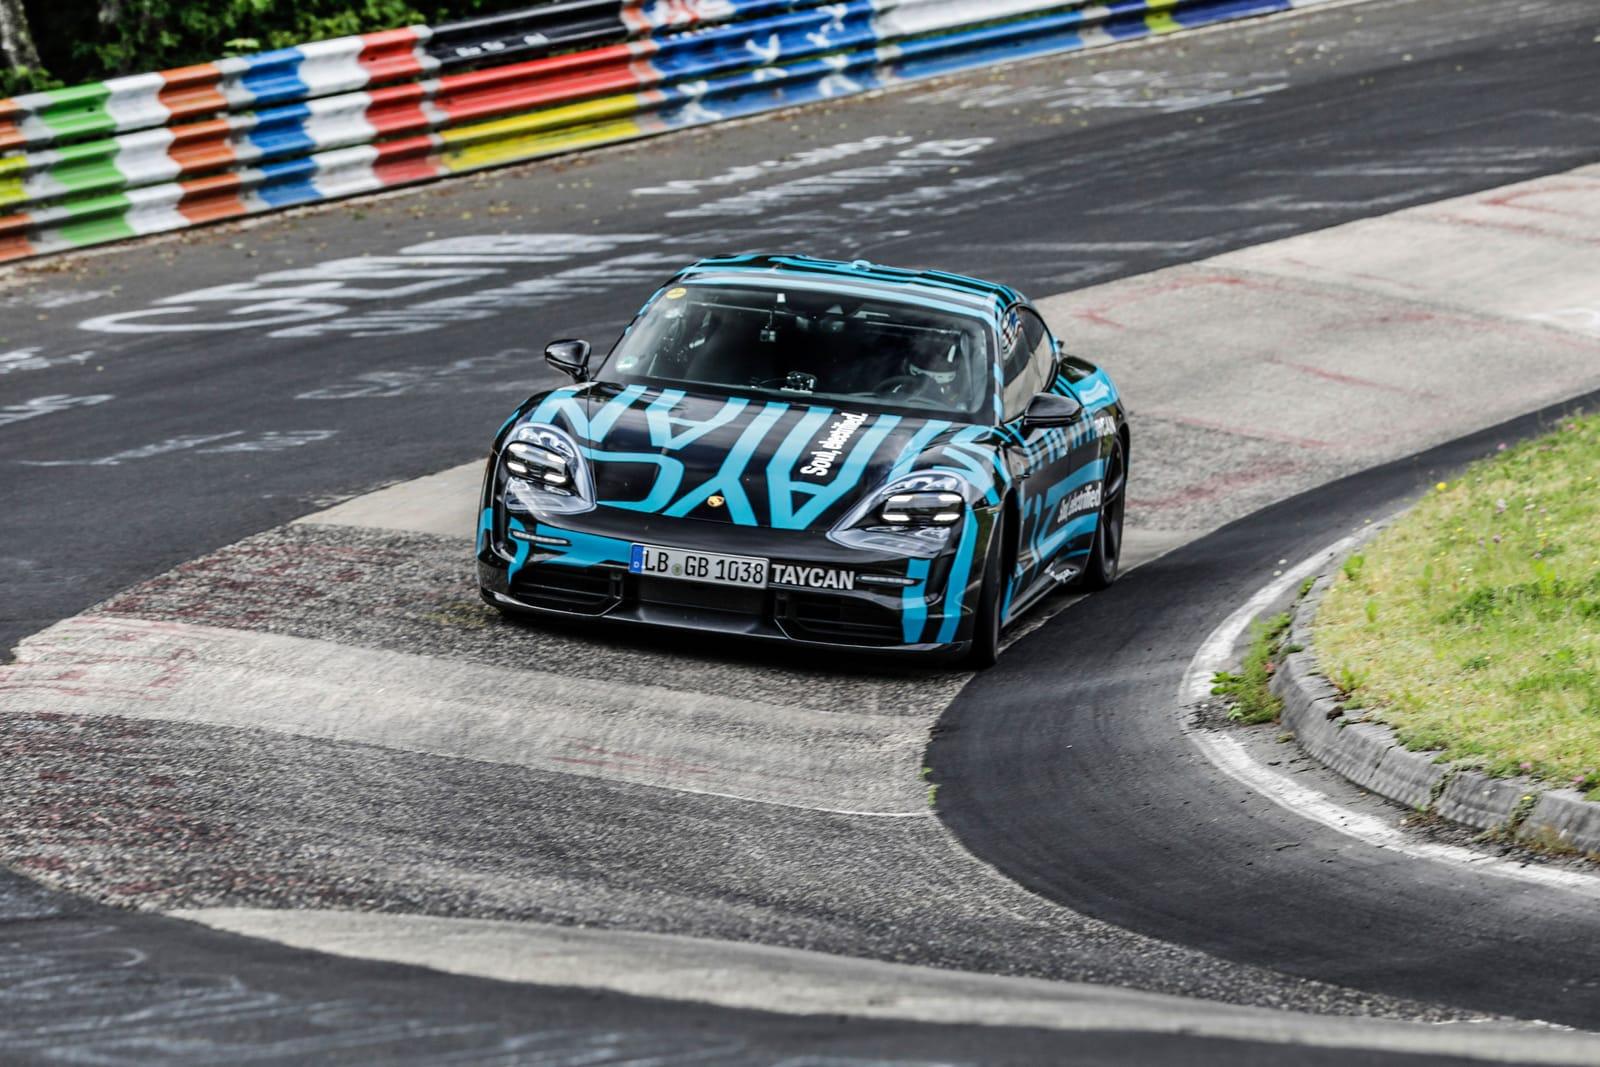 Porsche Taycan sets four-door EV speed record at the Nürburgring